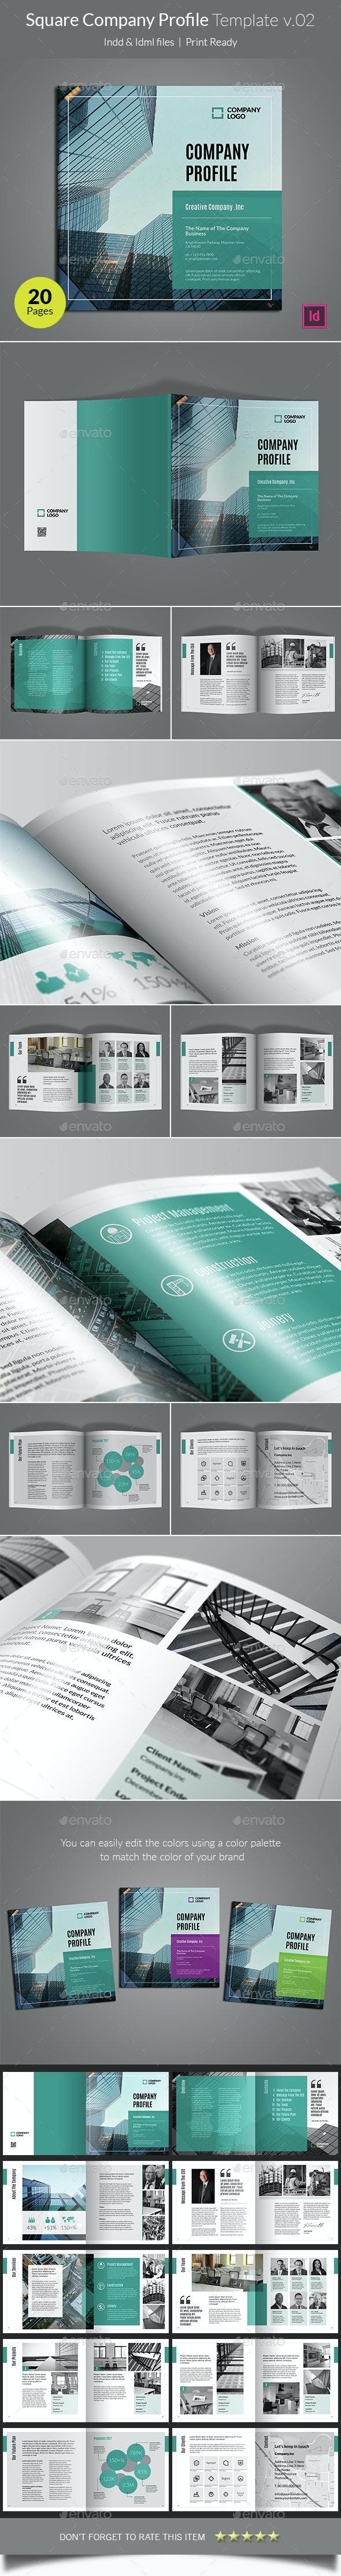 Company Profile Template V02 - Corporate Brochures